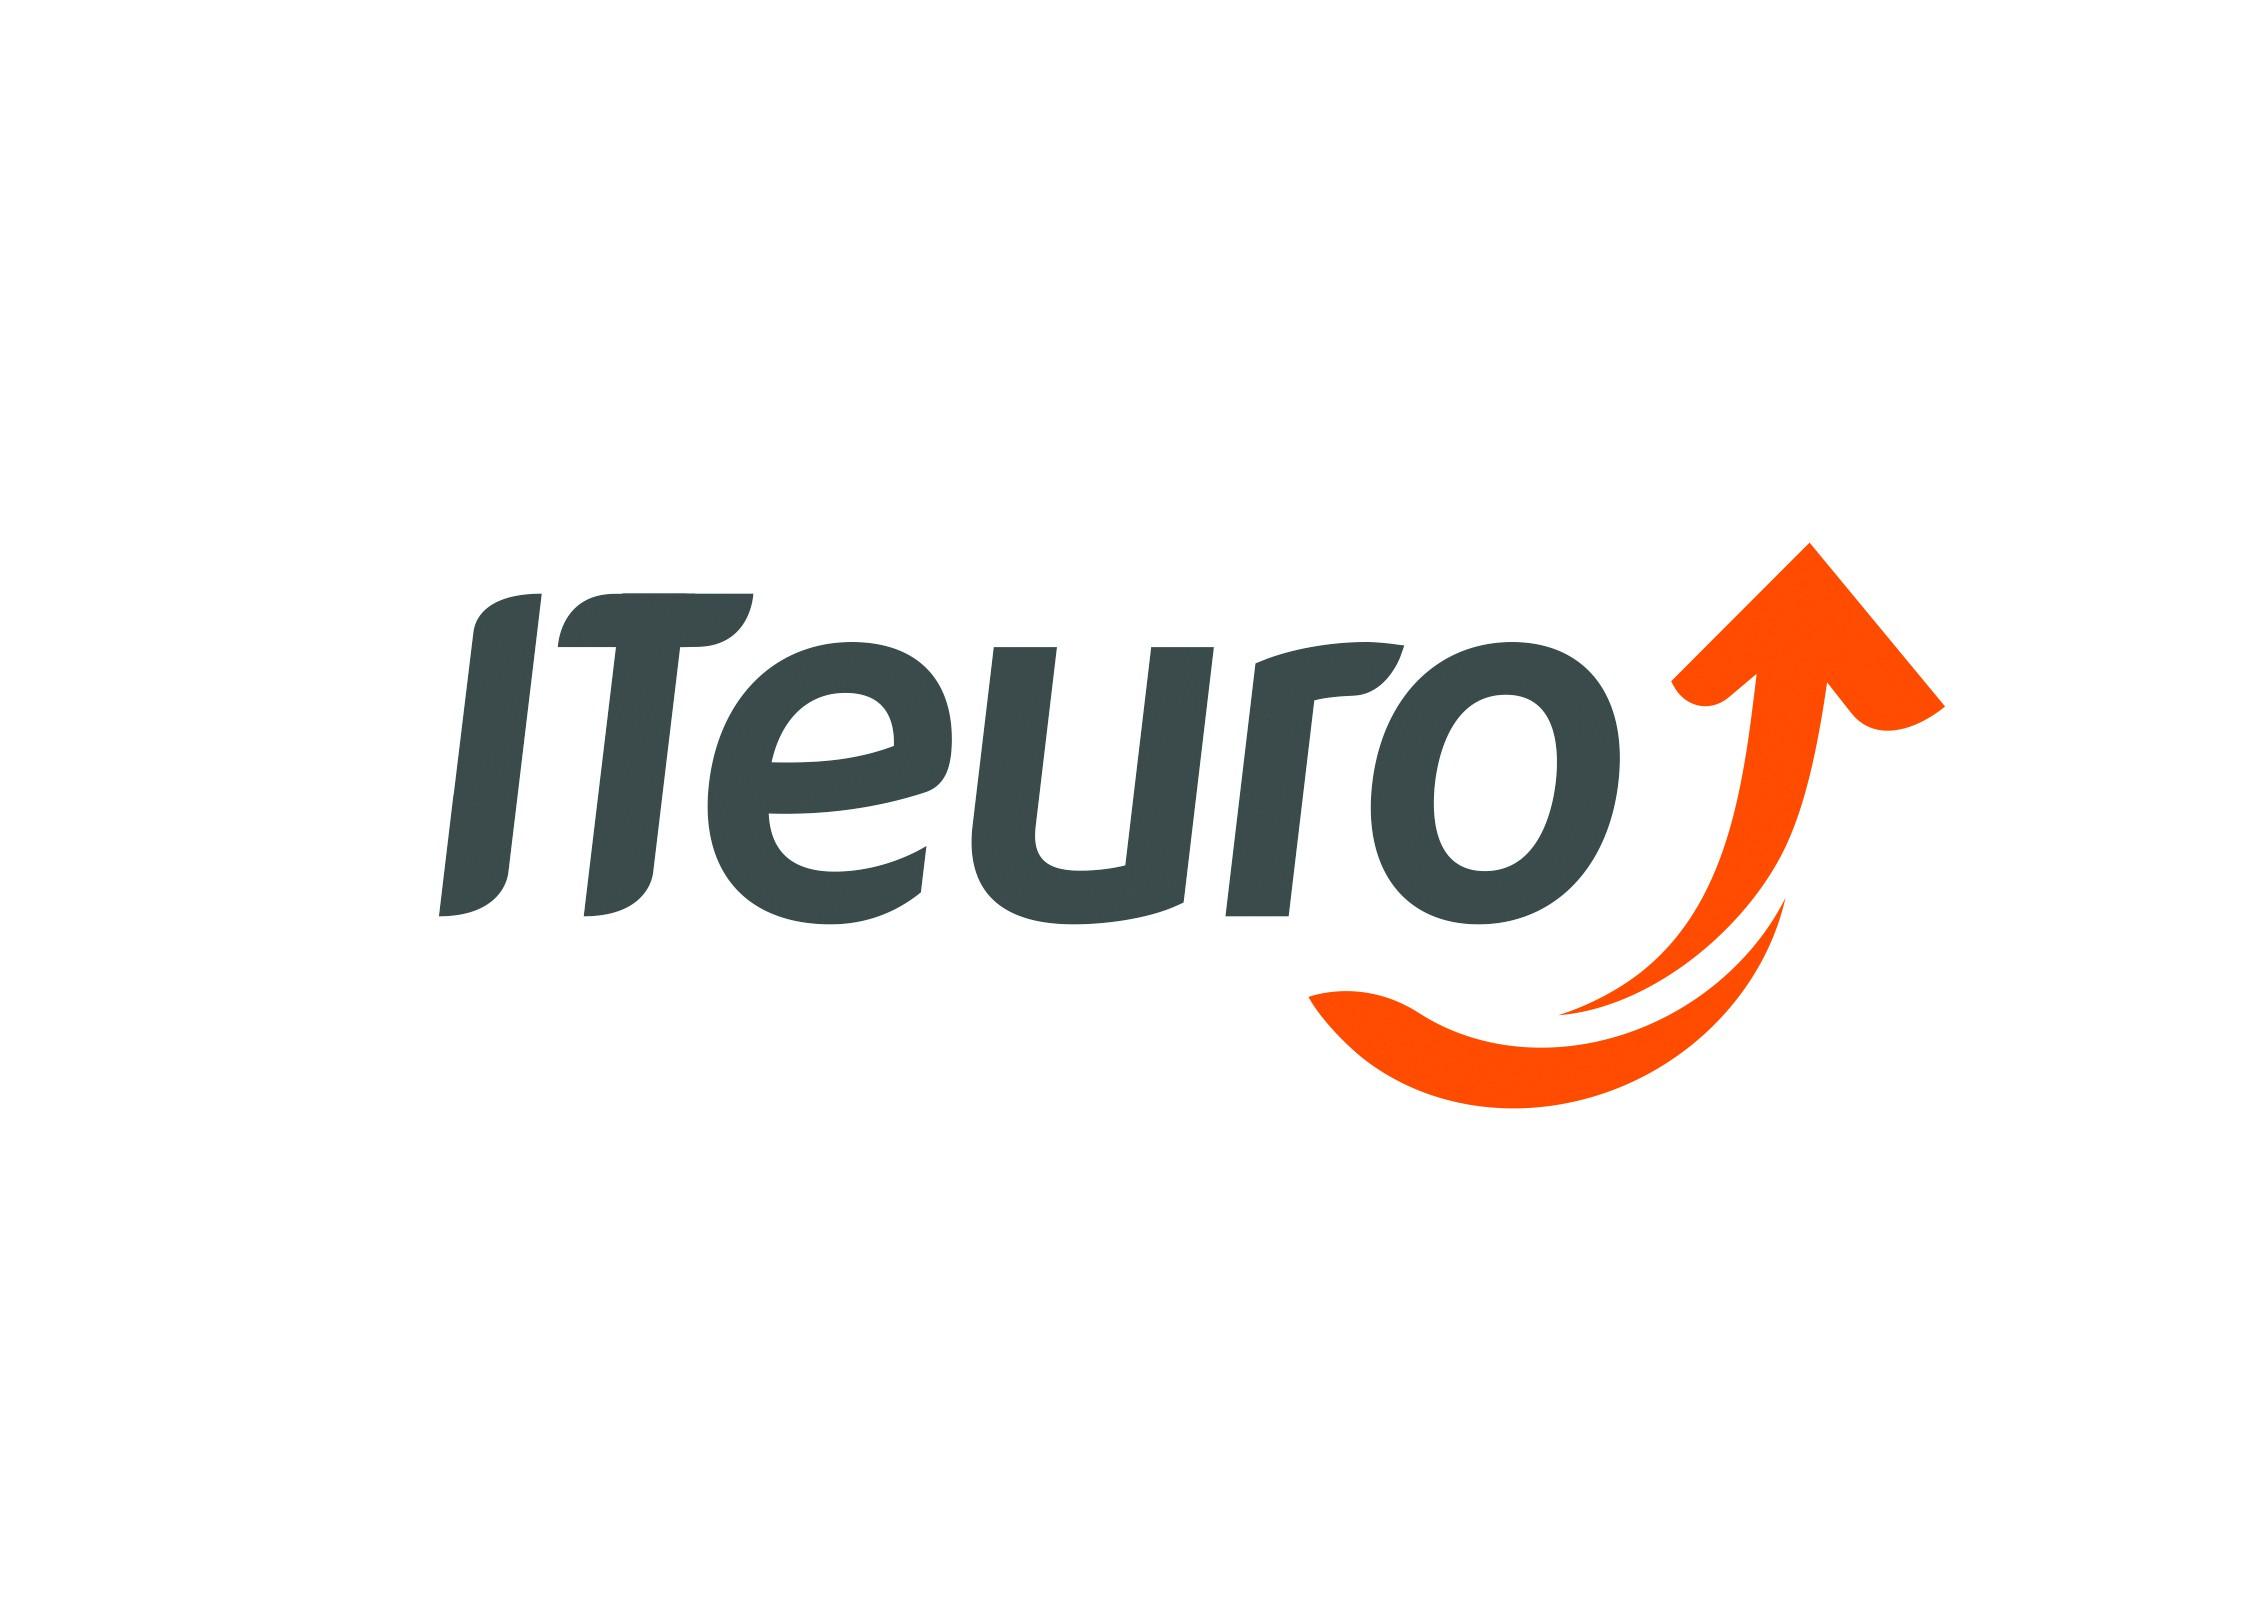 Logo ITEURO